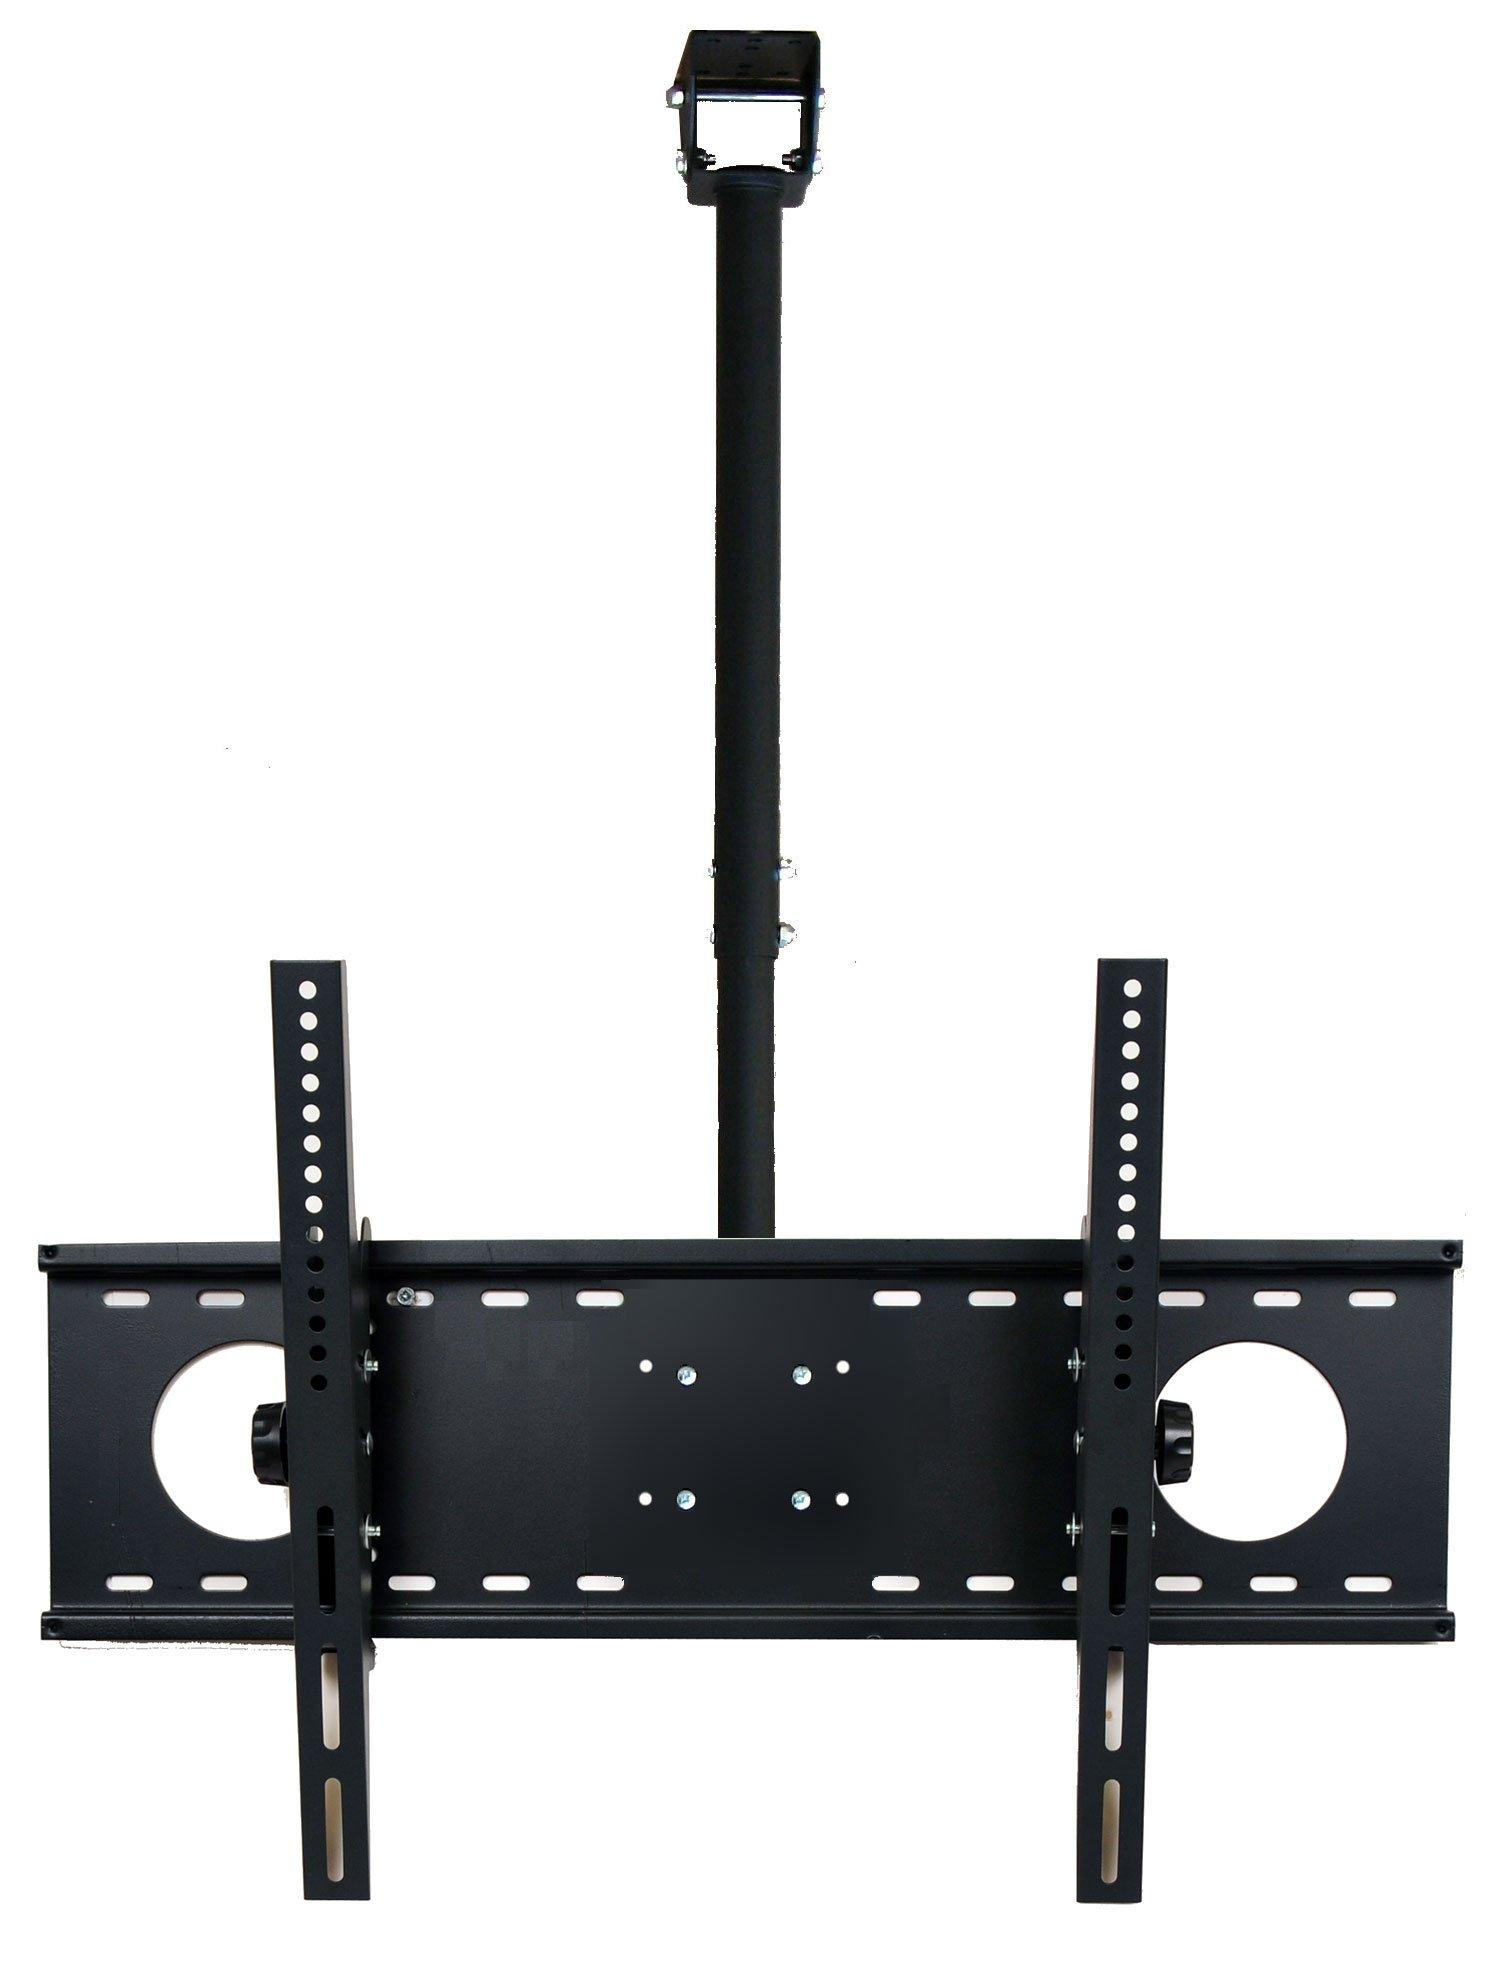 VideoSecu LCD Plasma Flat Panel TV Ceiling Mount Bracket for Most 37-60'' Plasma TV Flat Panel Displays, Some up to 75'' LED TV with VESA 200x200 400x400 600x400 680x460mm MPC53B 1S5